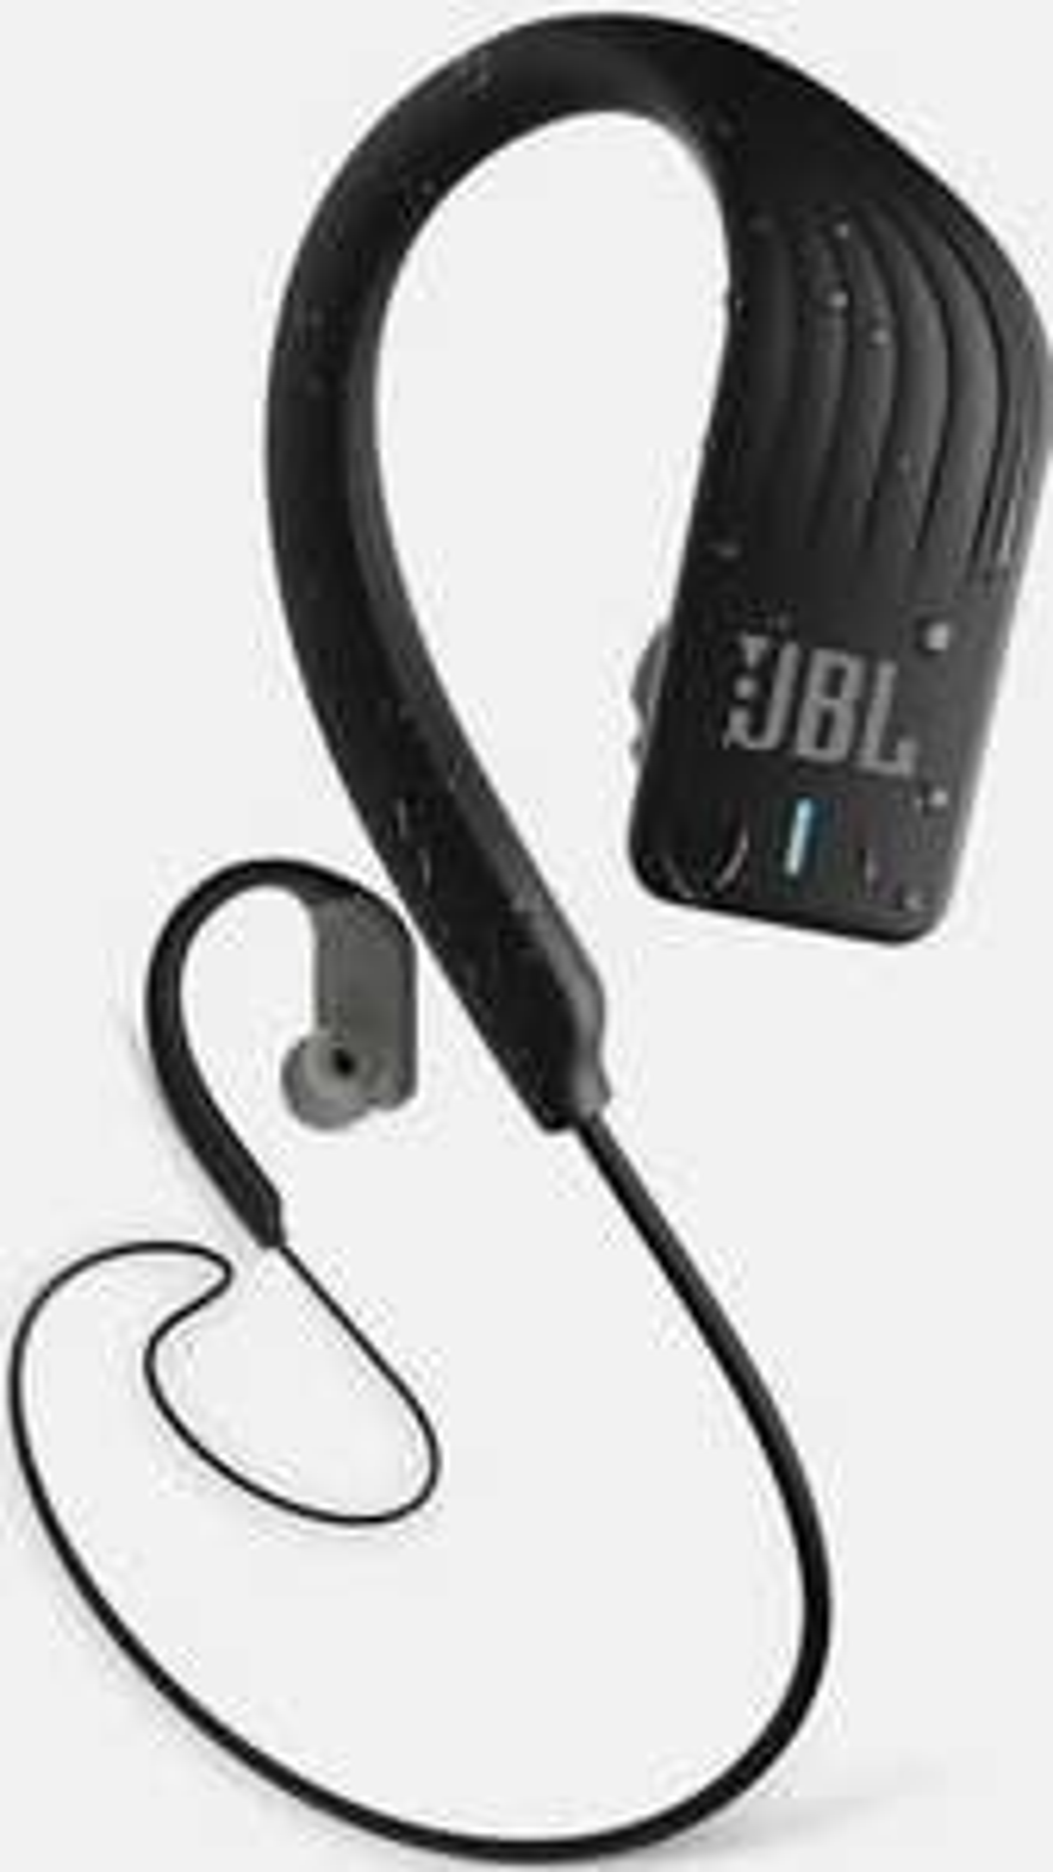 JBL Endurance Sprint Drahtlose In-Ear-Sportkopfhörer